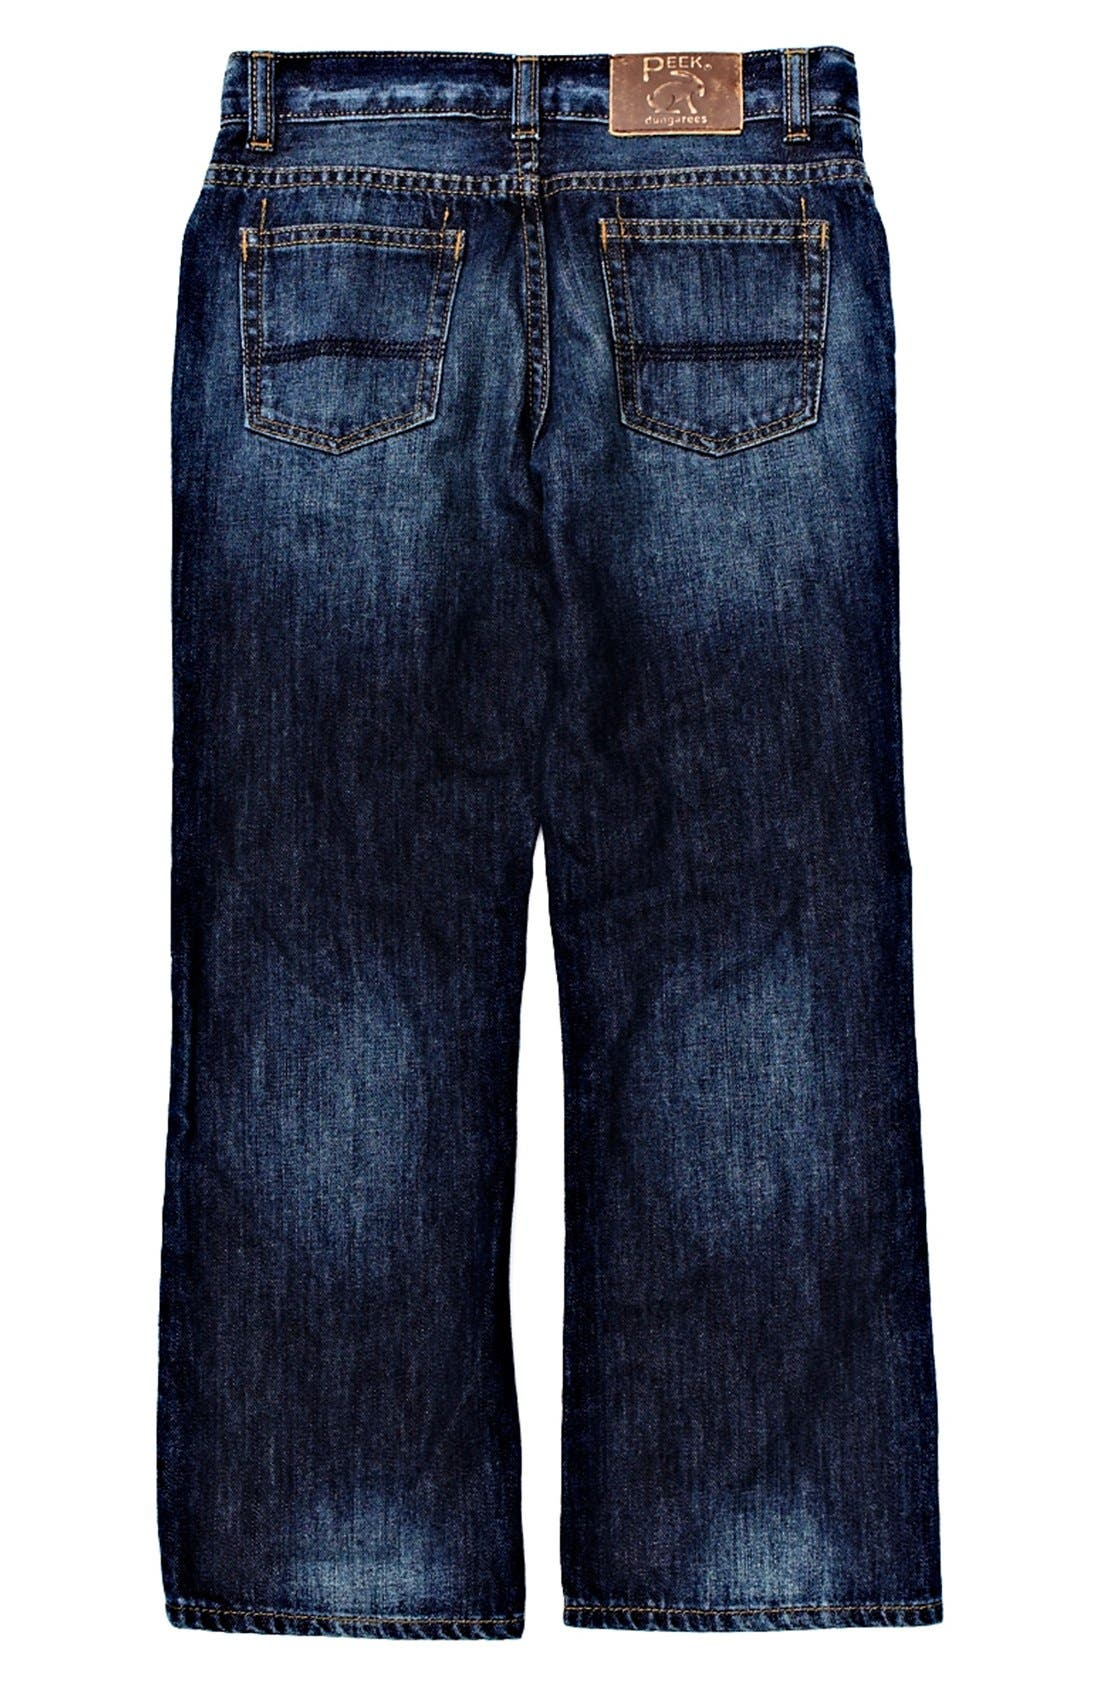 Main Image - Peek 'Sullivan' Jeans (Toddler Boys, Little Boys & Big Boys)